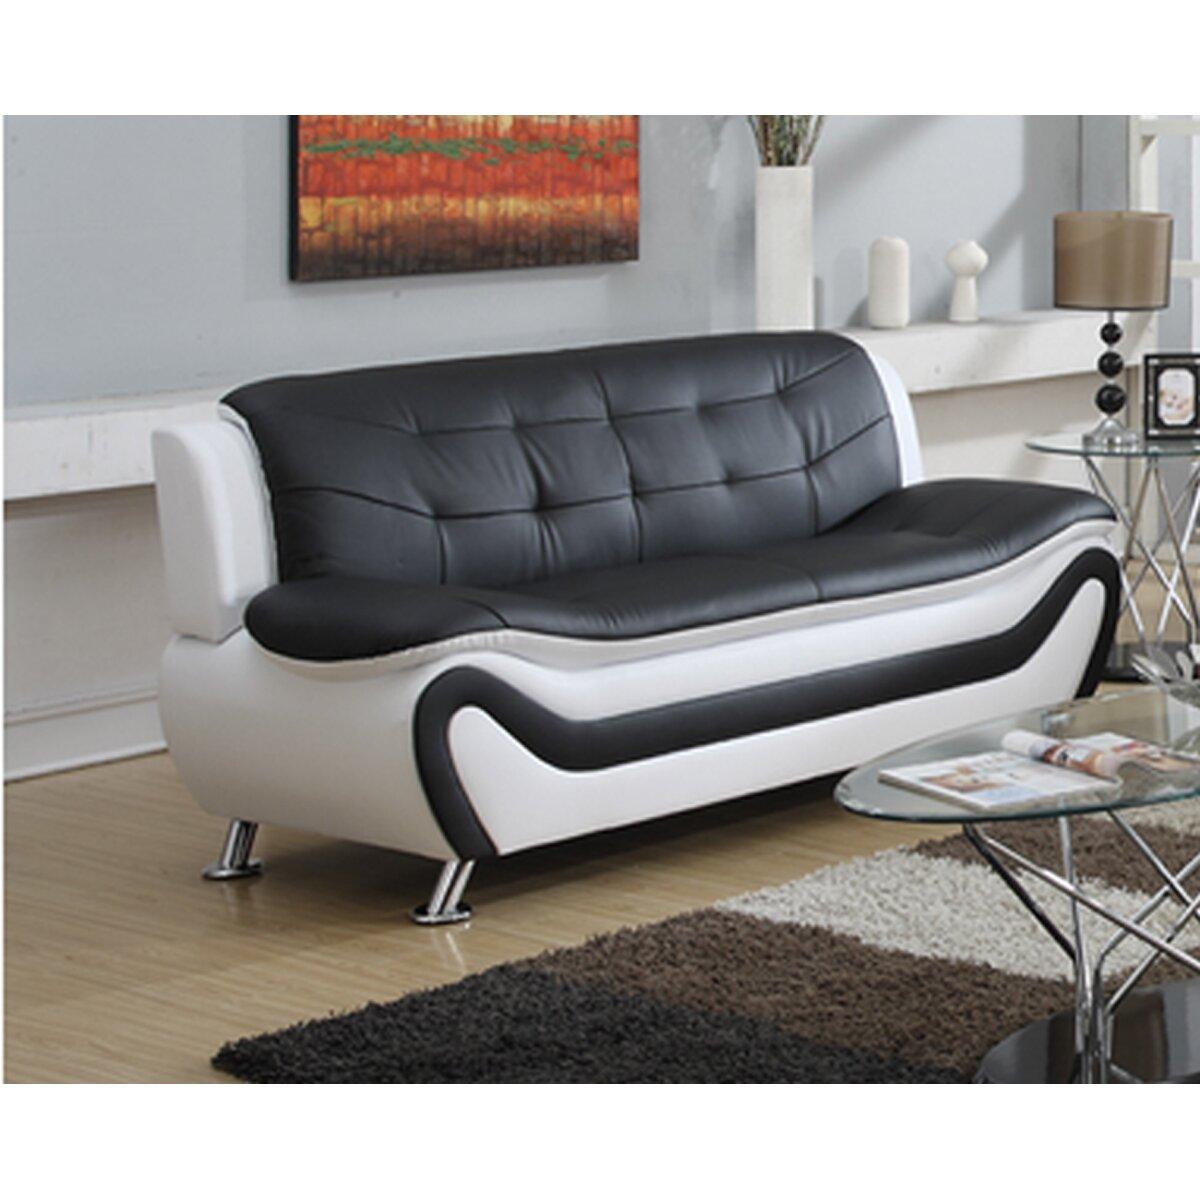 Wayfair Living Room Furniture Pdaeinc Tiffany Modern Living Room Sofa Reviews Wayfair